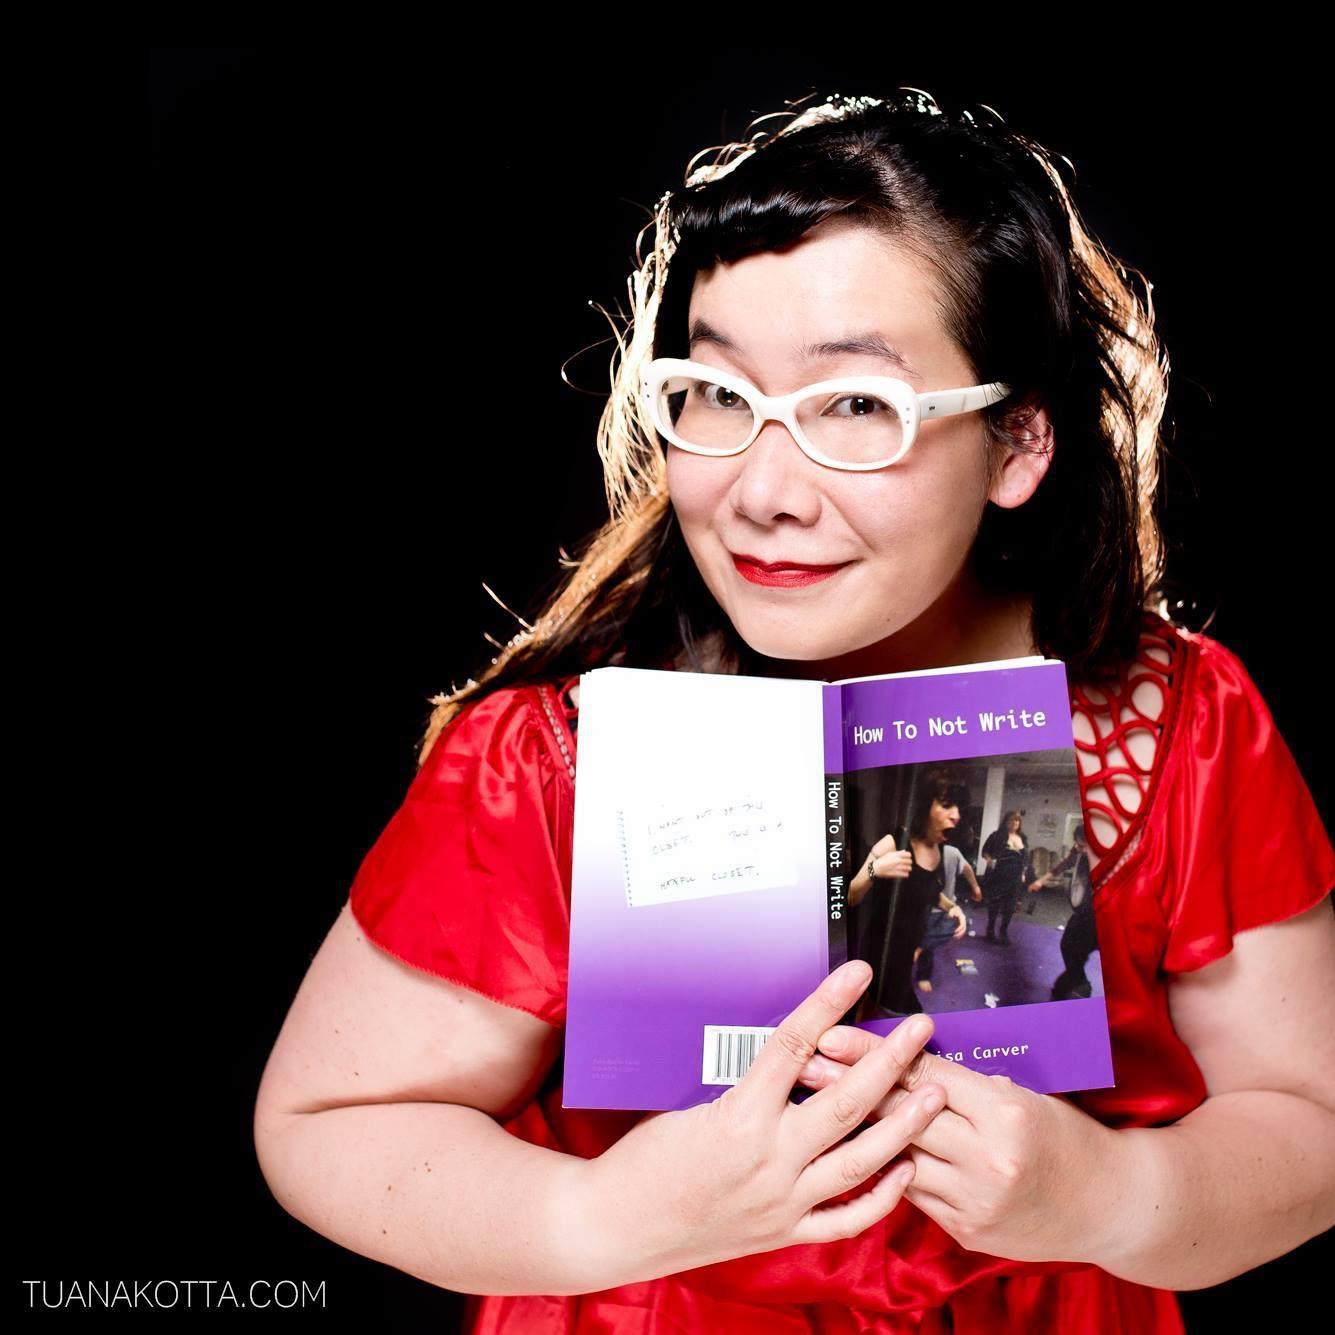 Celeste Chan